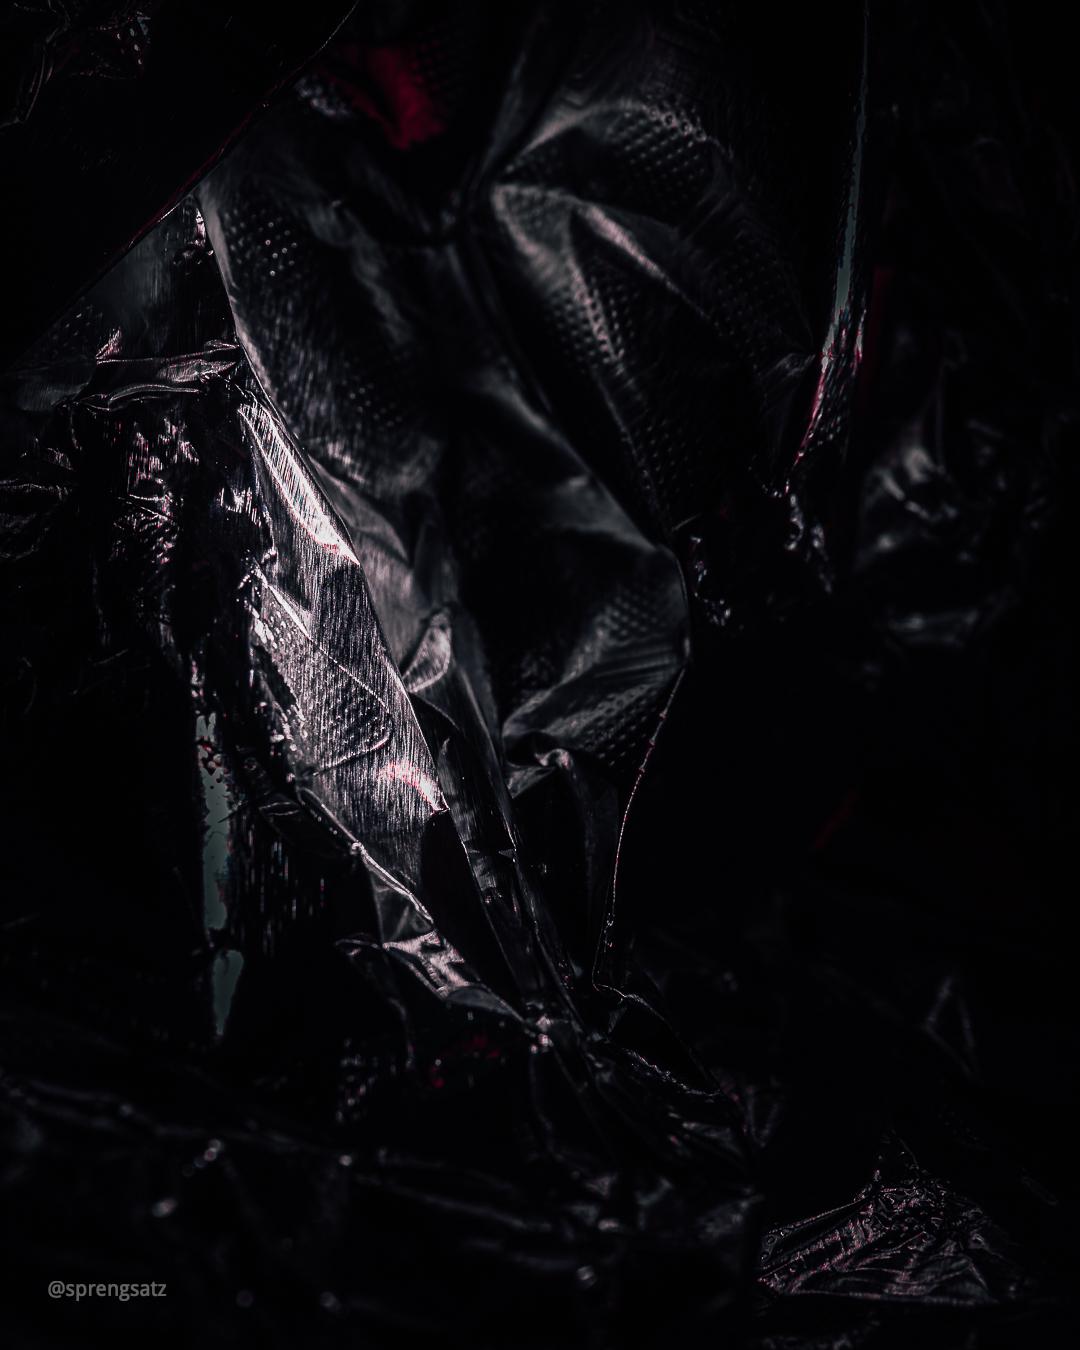 Abstrakte Fotografie mit Aluminiumfolie